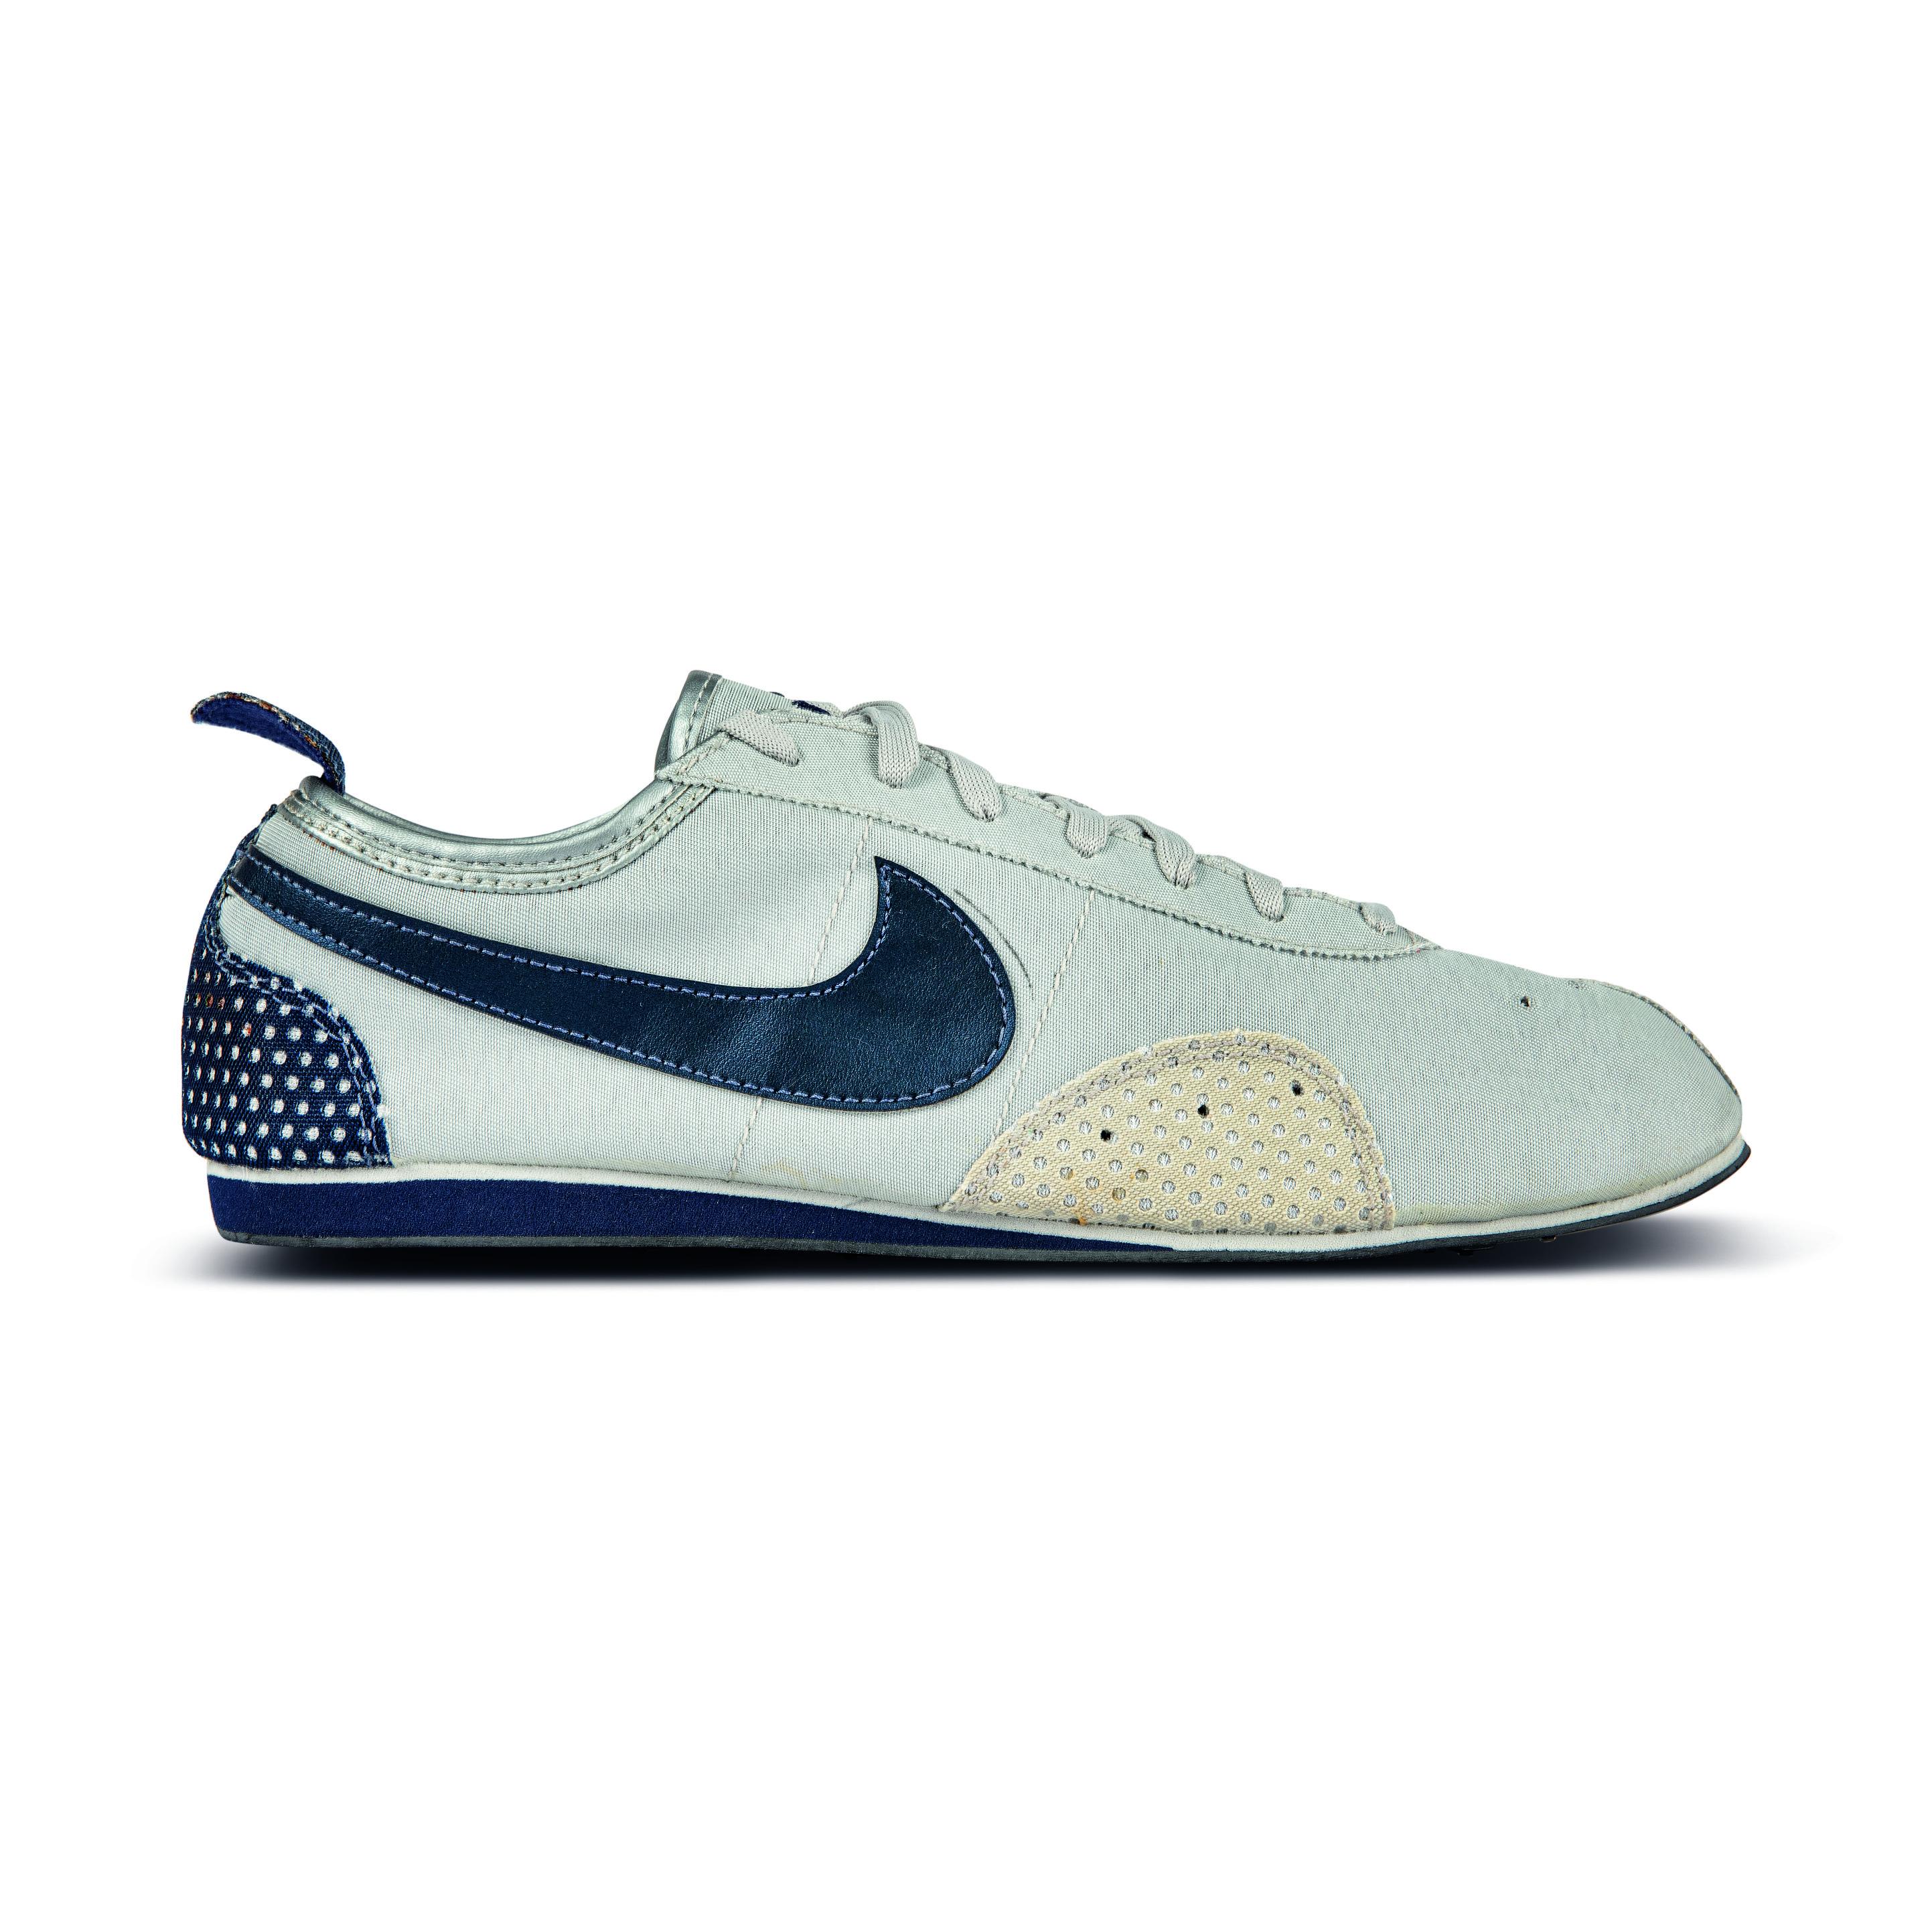 size-11-nike-moon-shoe-retro-55d6